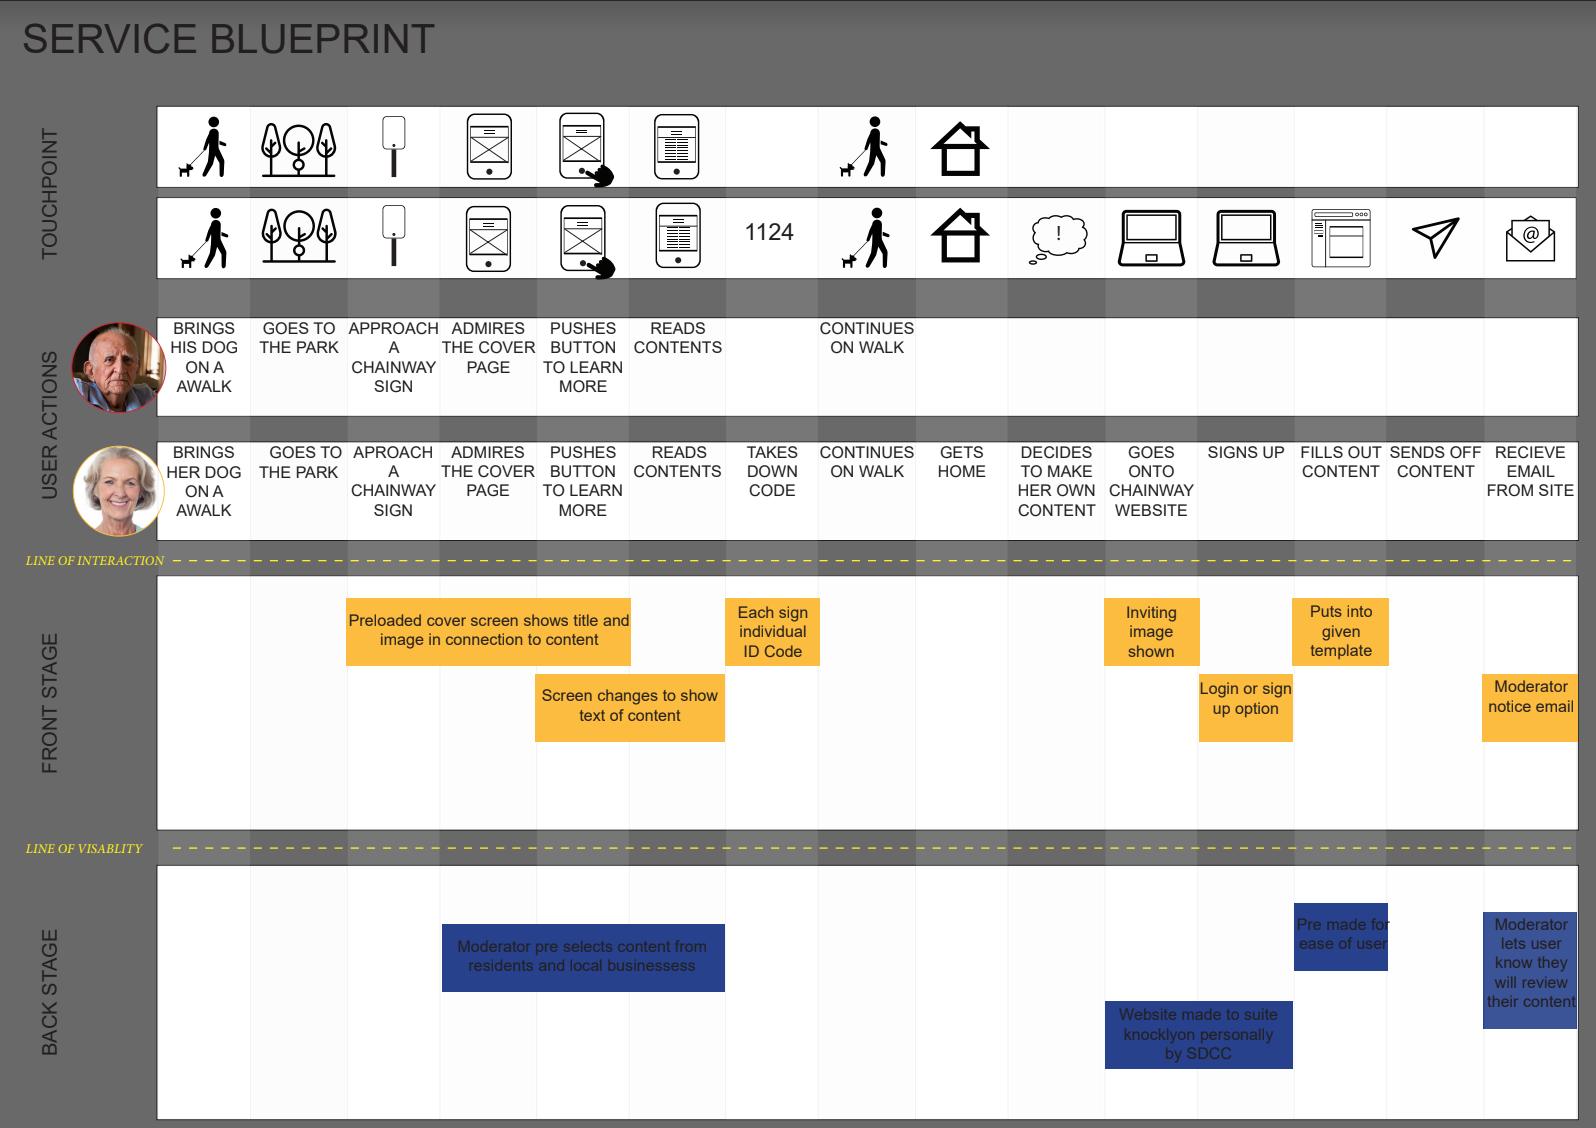 Service Blueprint example of community members